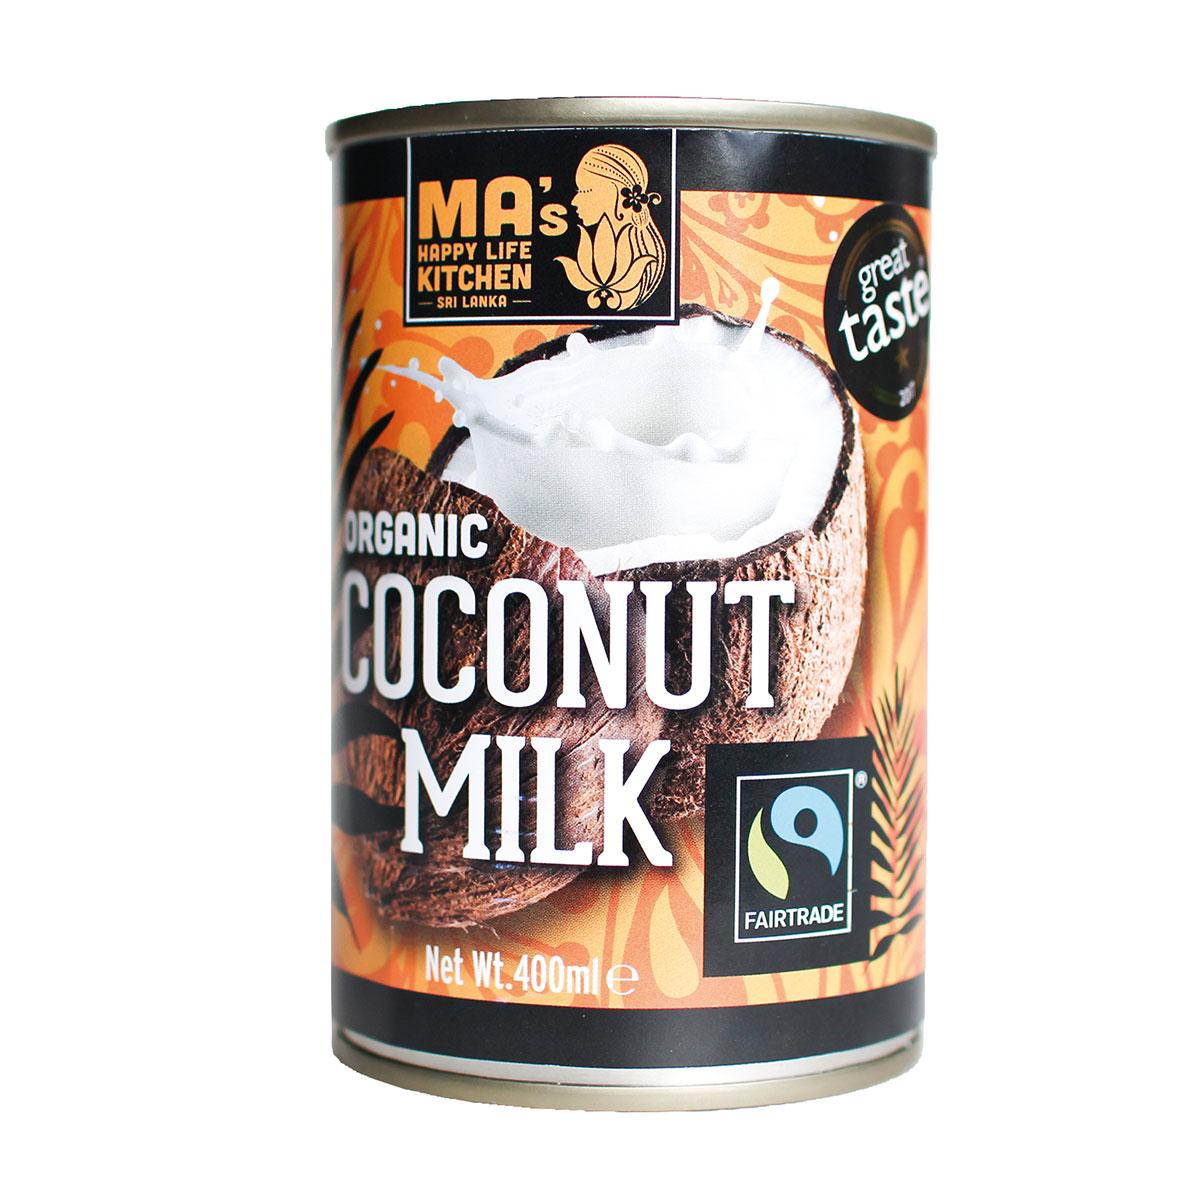 Fairtrade & Organic Coconut Milk - 400ml